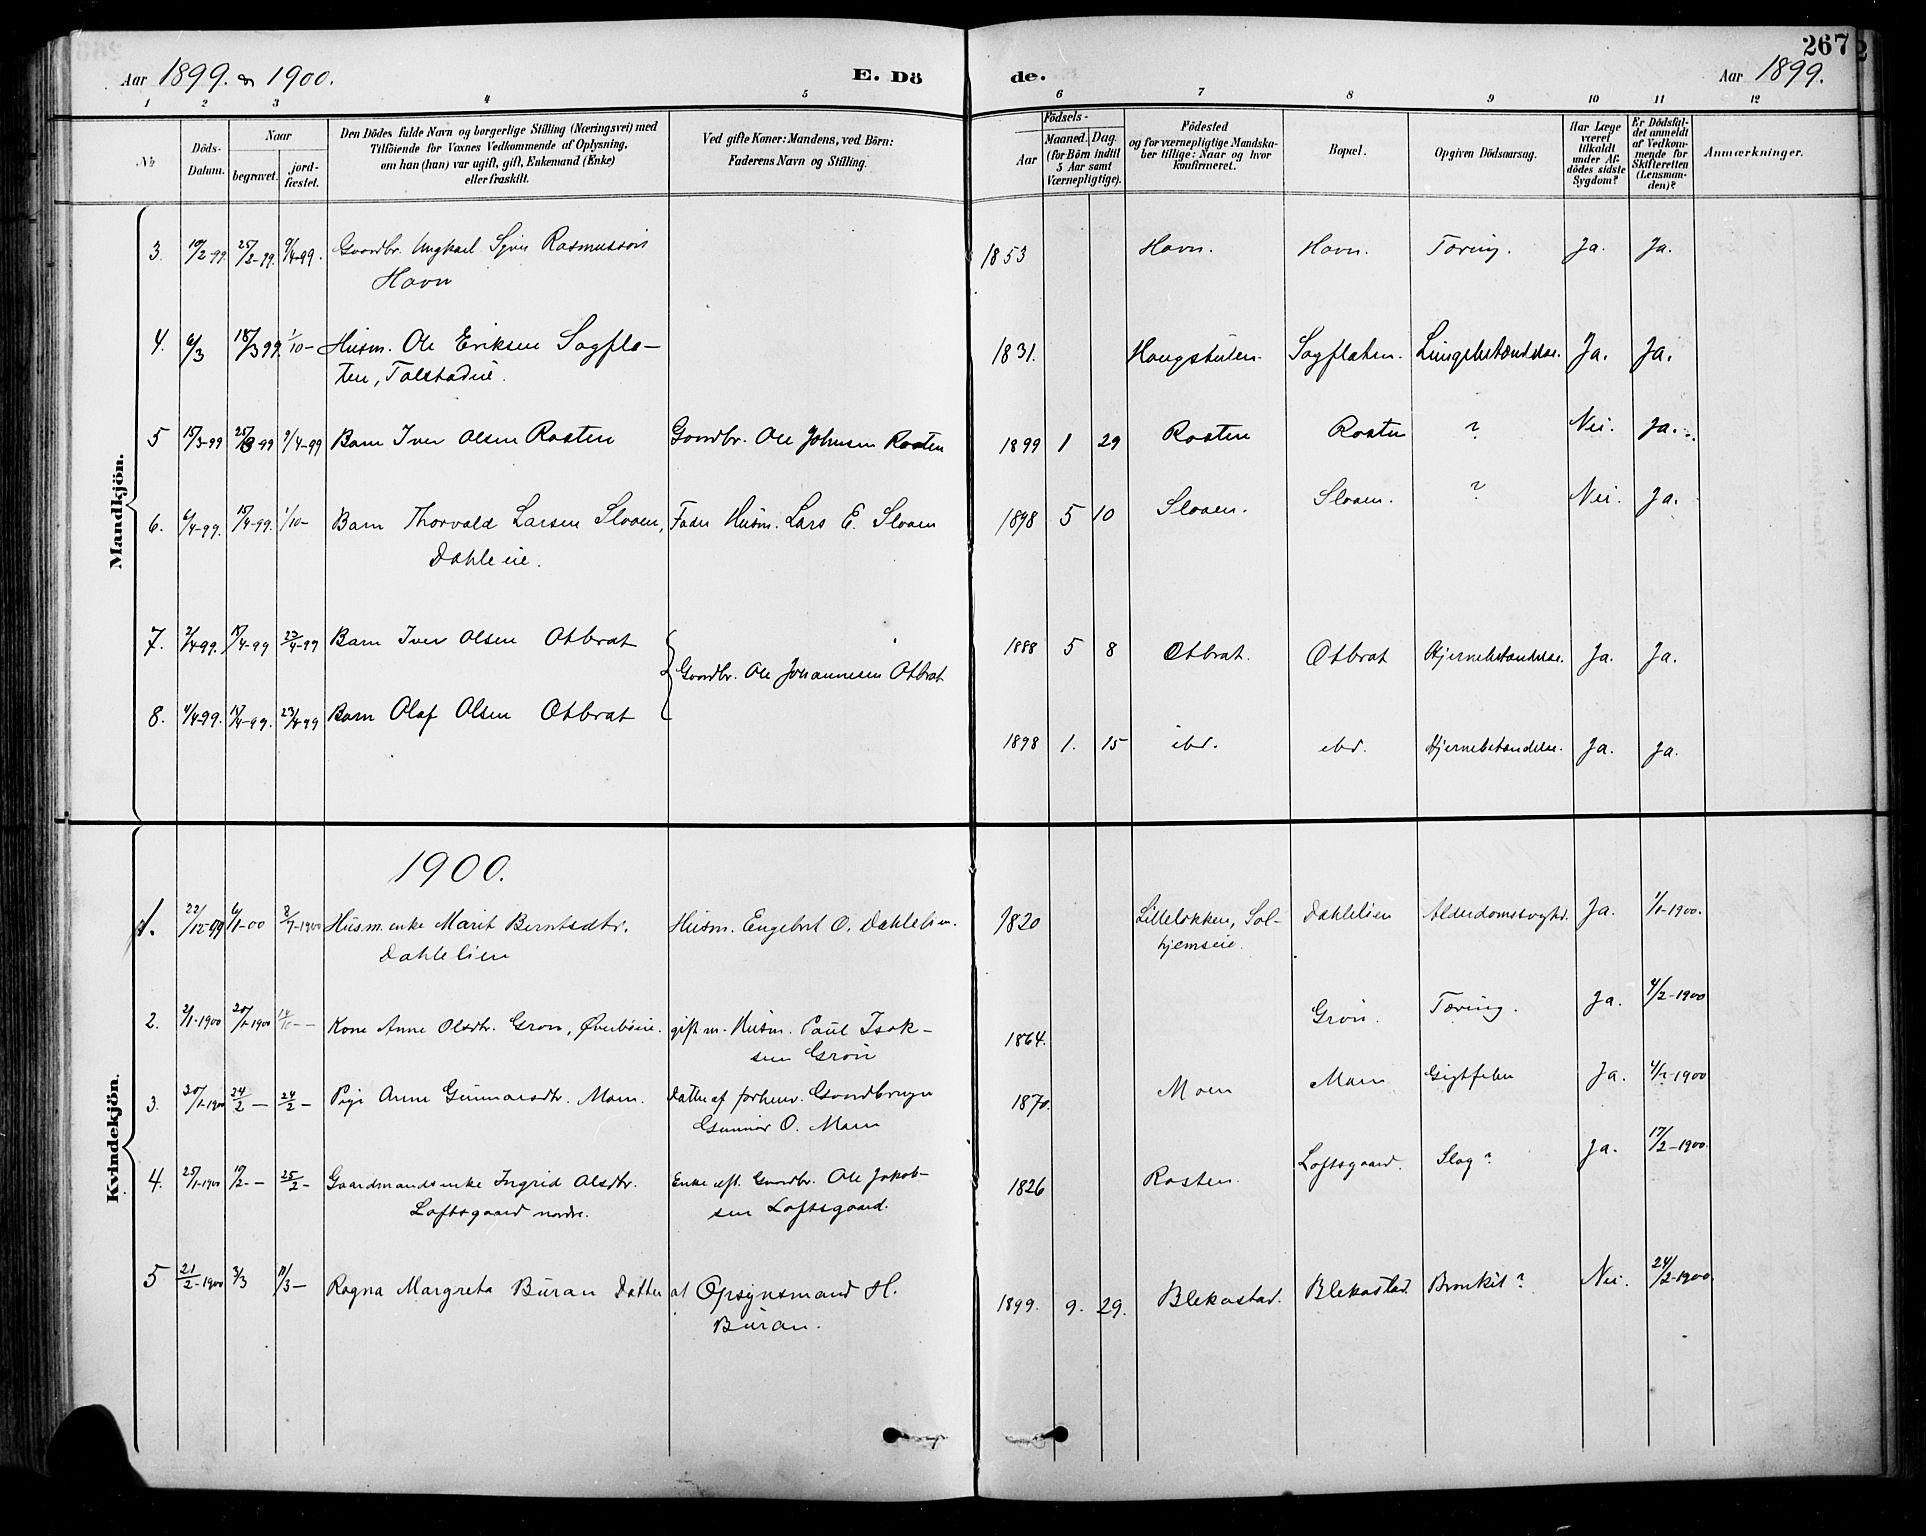 SAH, Sel prestekontor, Klokkerbok nr. 1, 1894-1923, s. 267